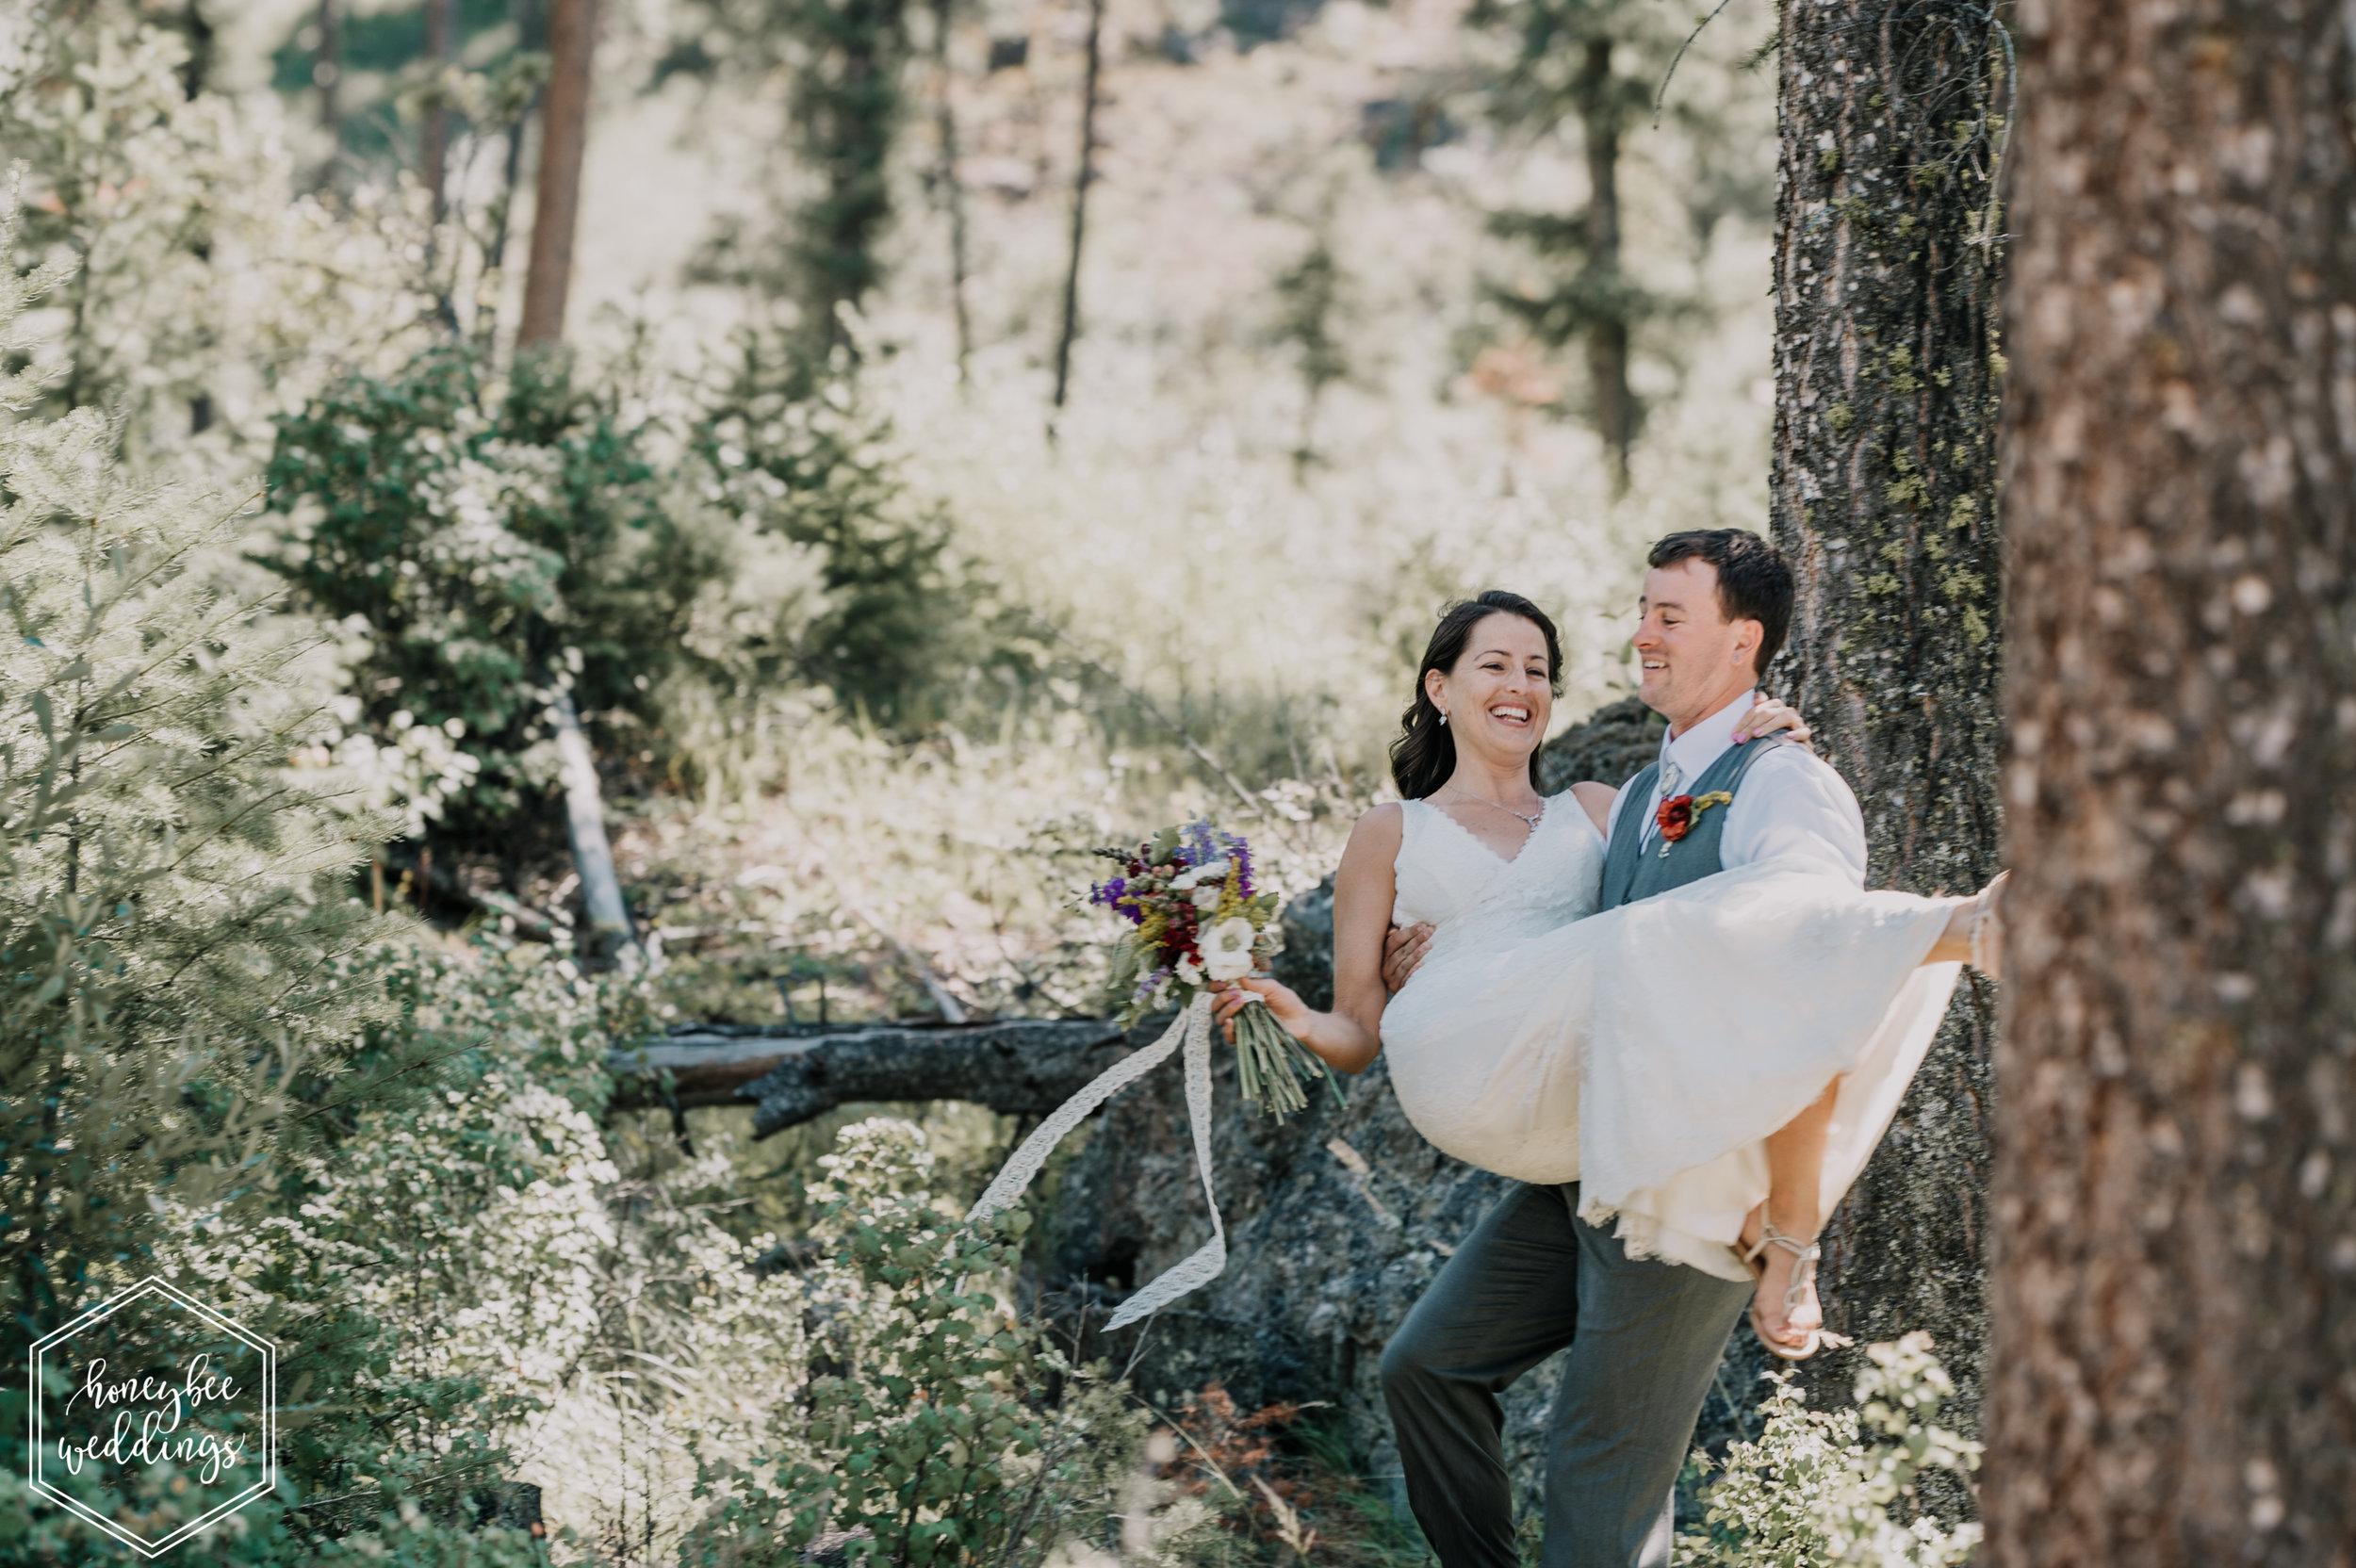 222 White Raven Wedding_Montana Wedding Photographer_Honeybee Weddings_ Meghan Maloney + Arza Hammond 2018-8512.jpg